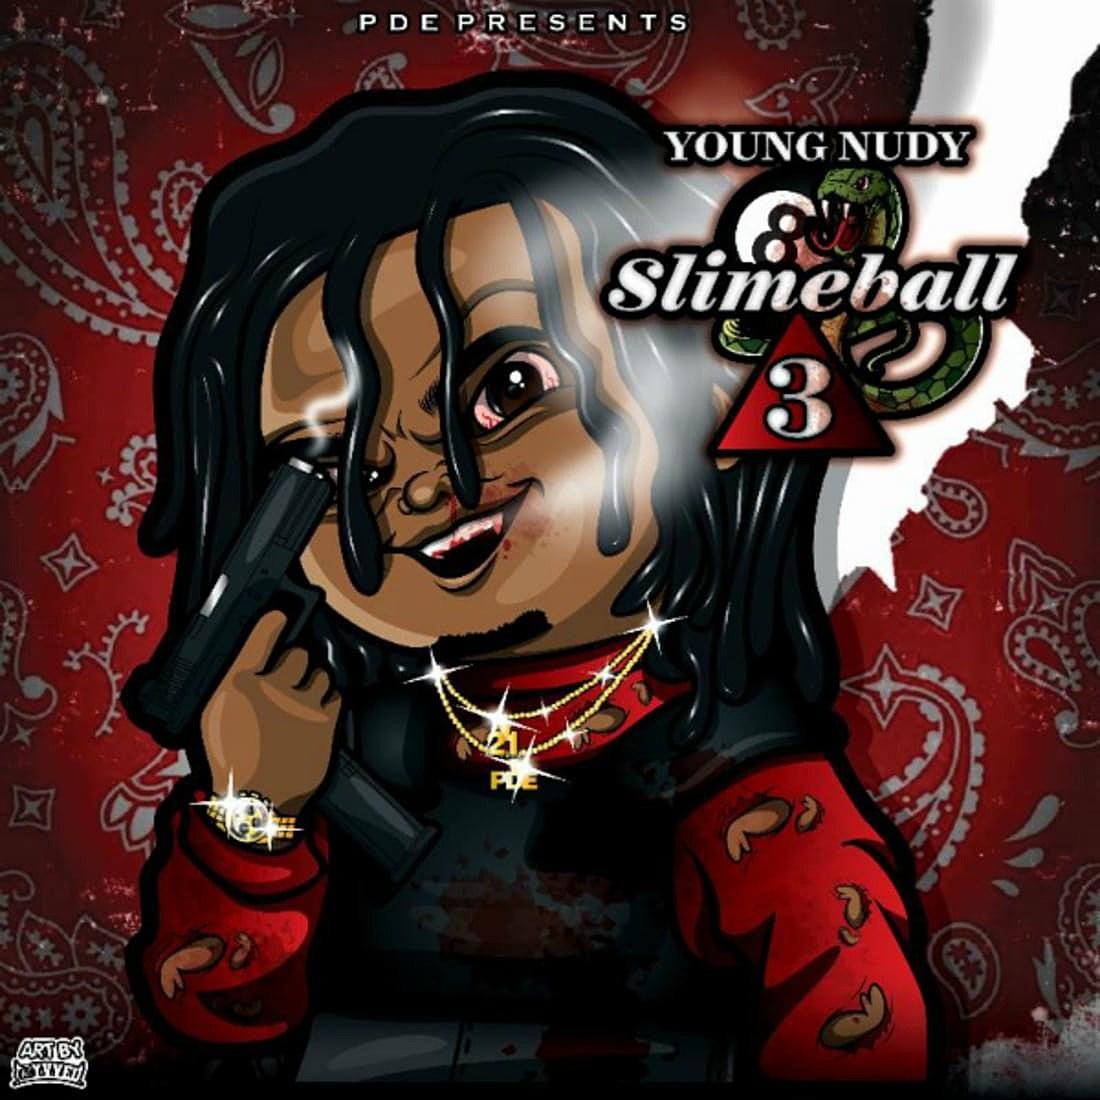 http://www.xxlmag.com/files/2018/08/young-nudy-slimeball-3-album-cover.jpeg?w=1100&h=1100&q=75